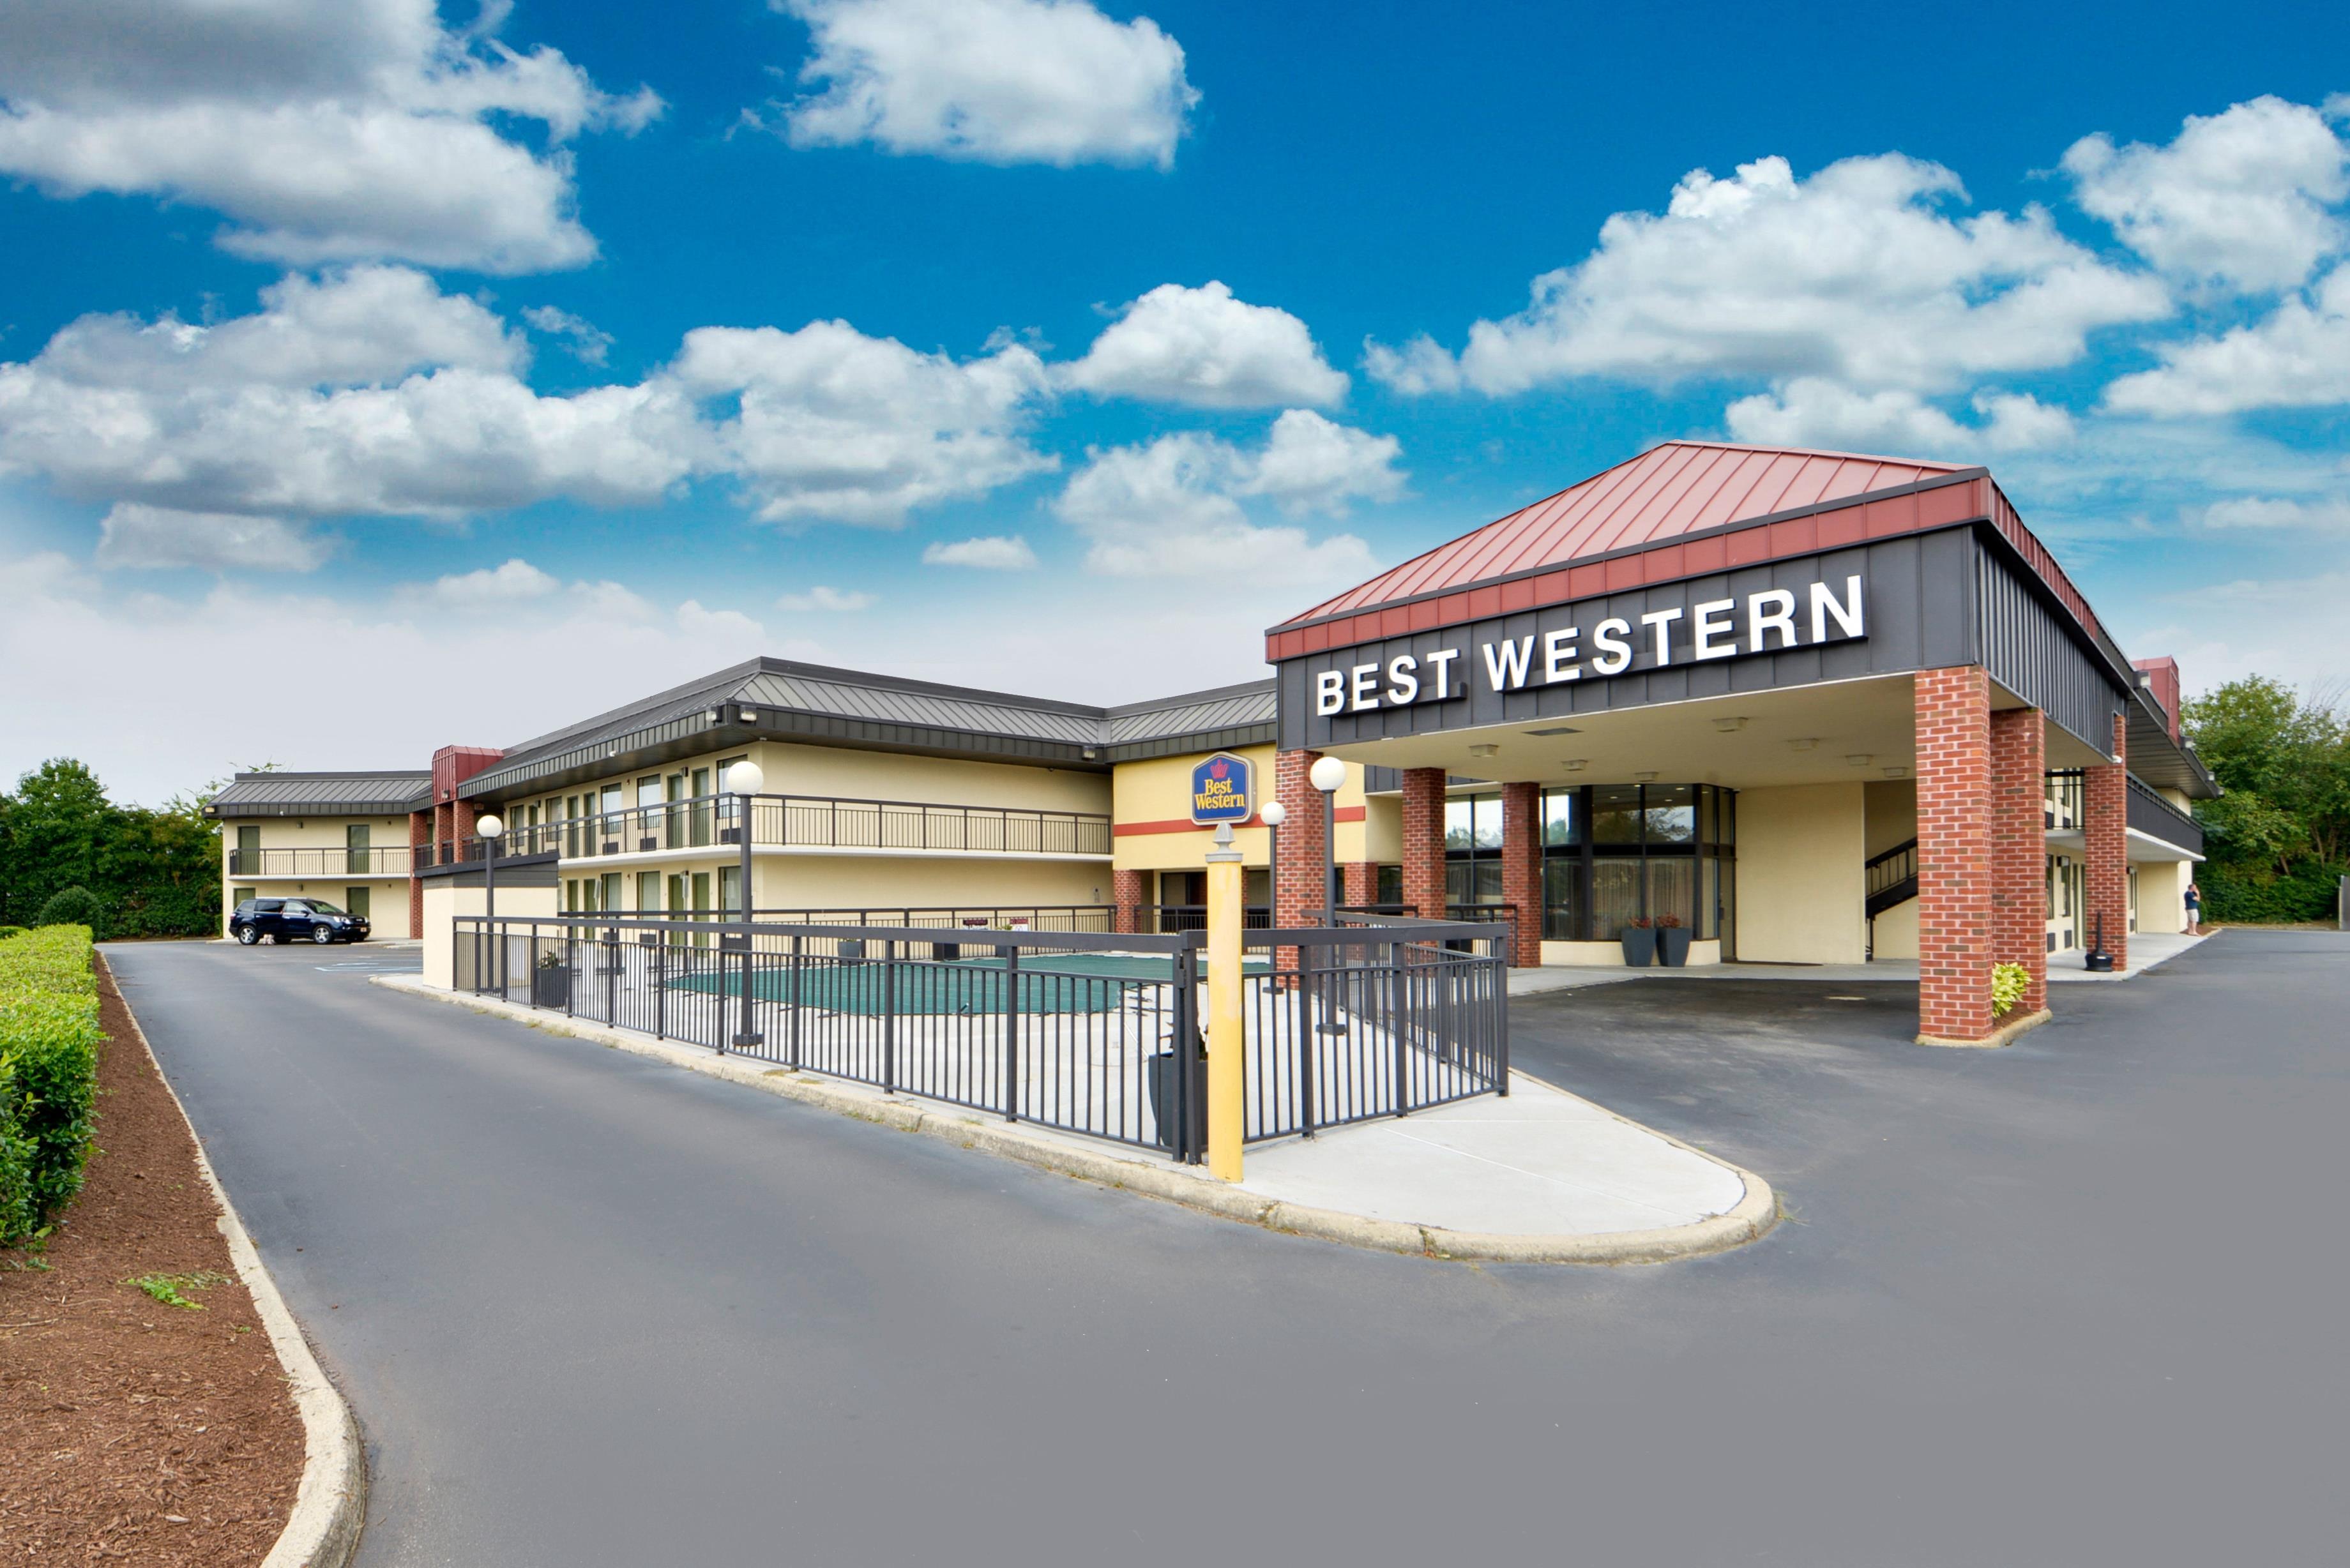 Best western center inn in virginia beach va 757 363 2 for Best western virginia beach